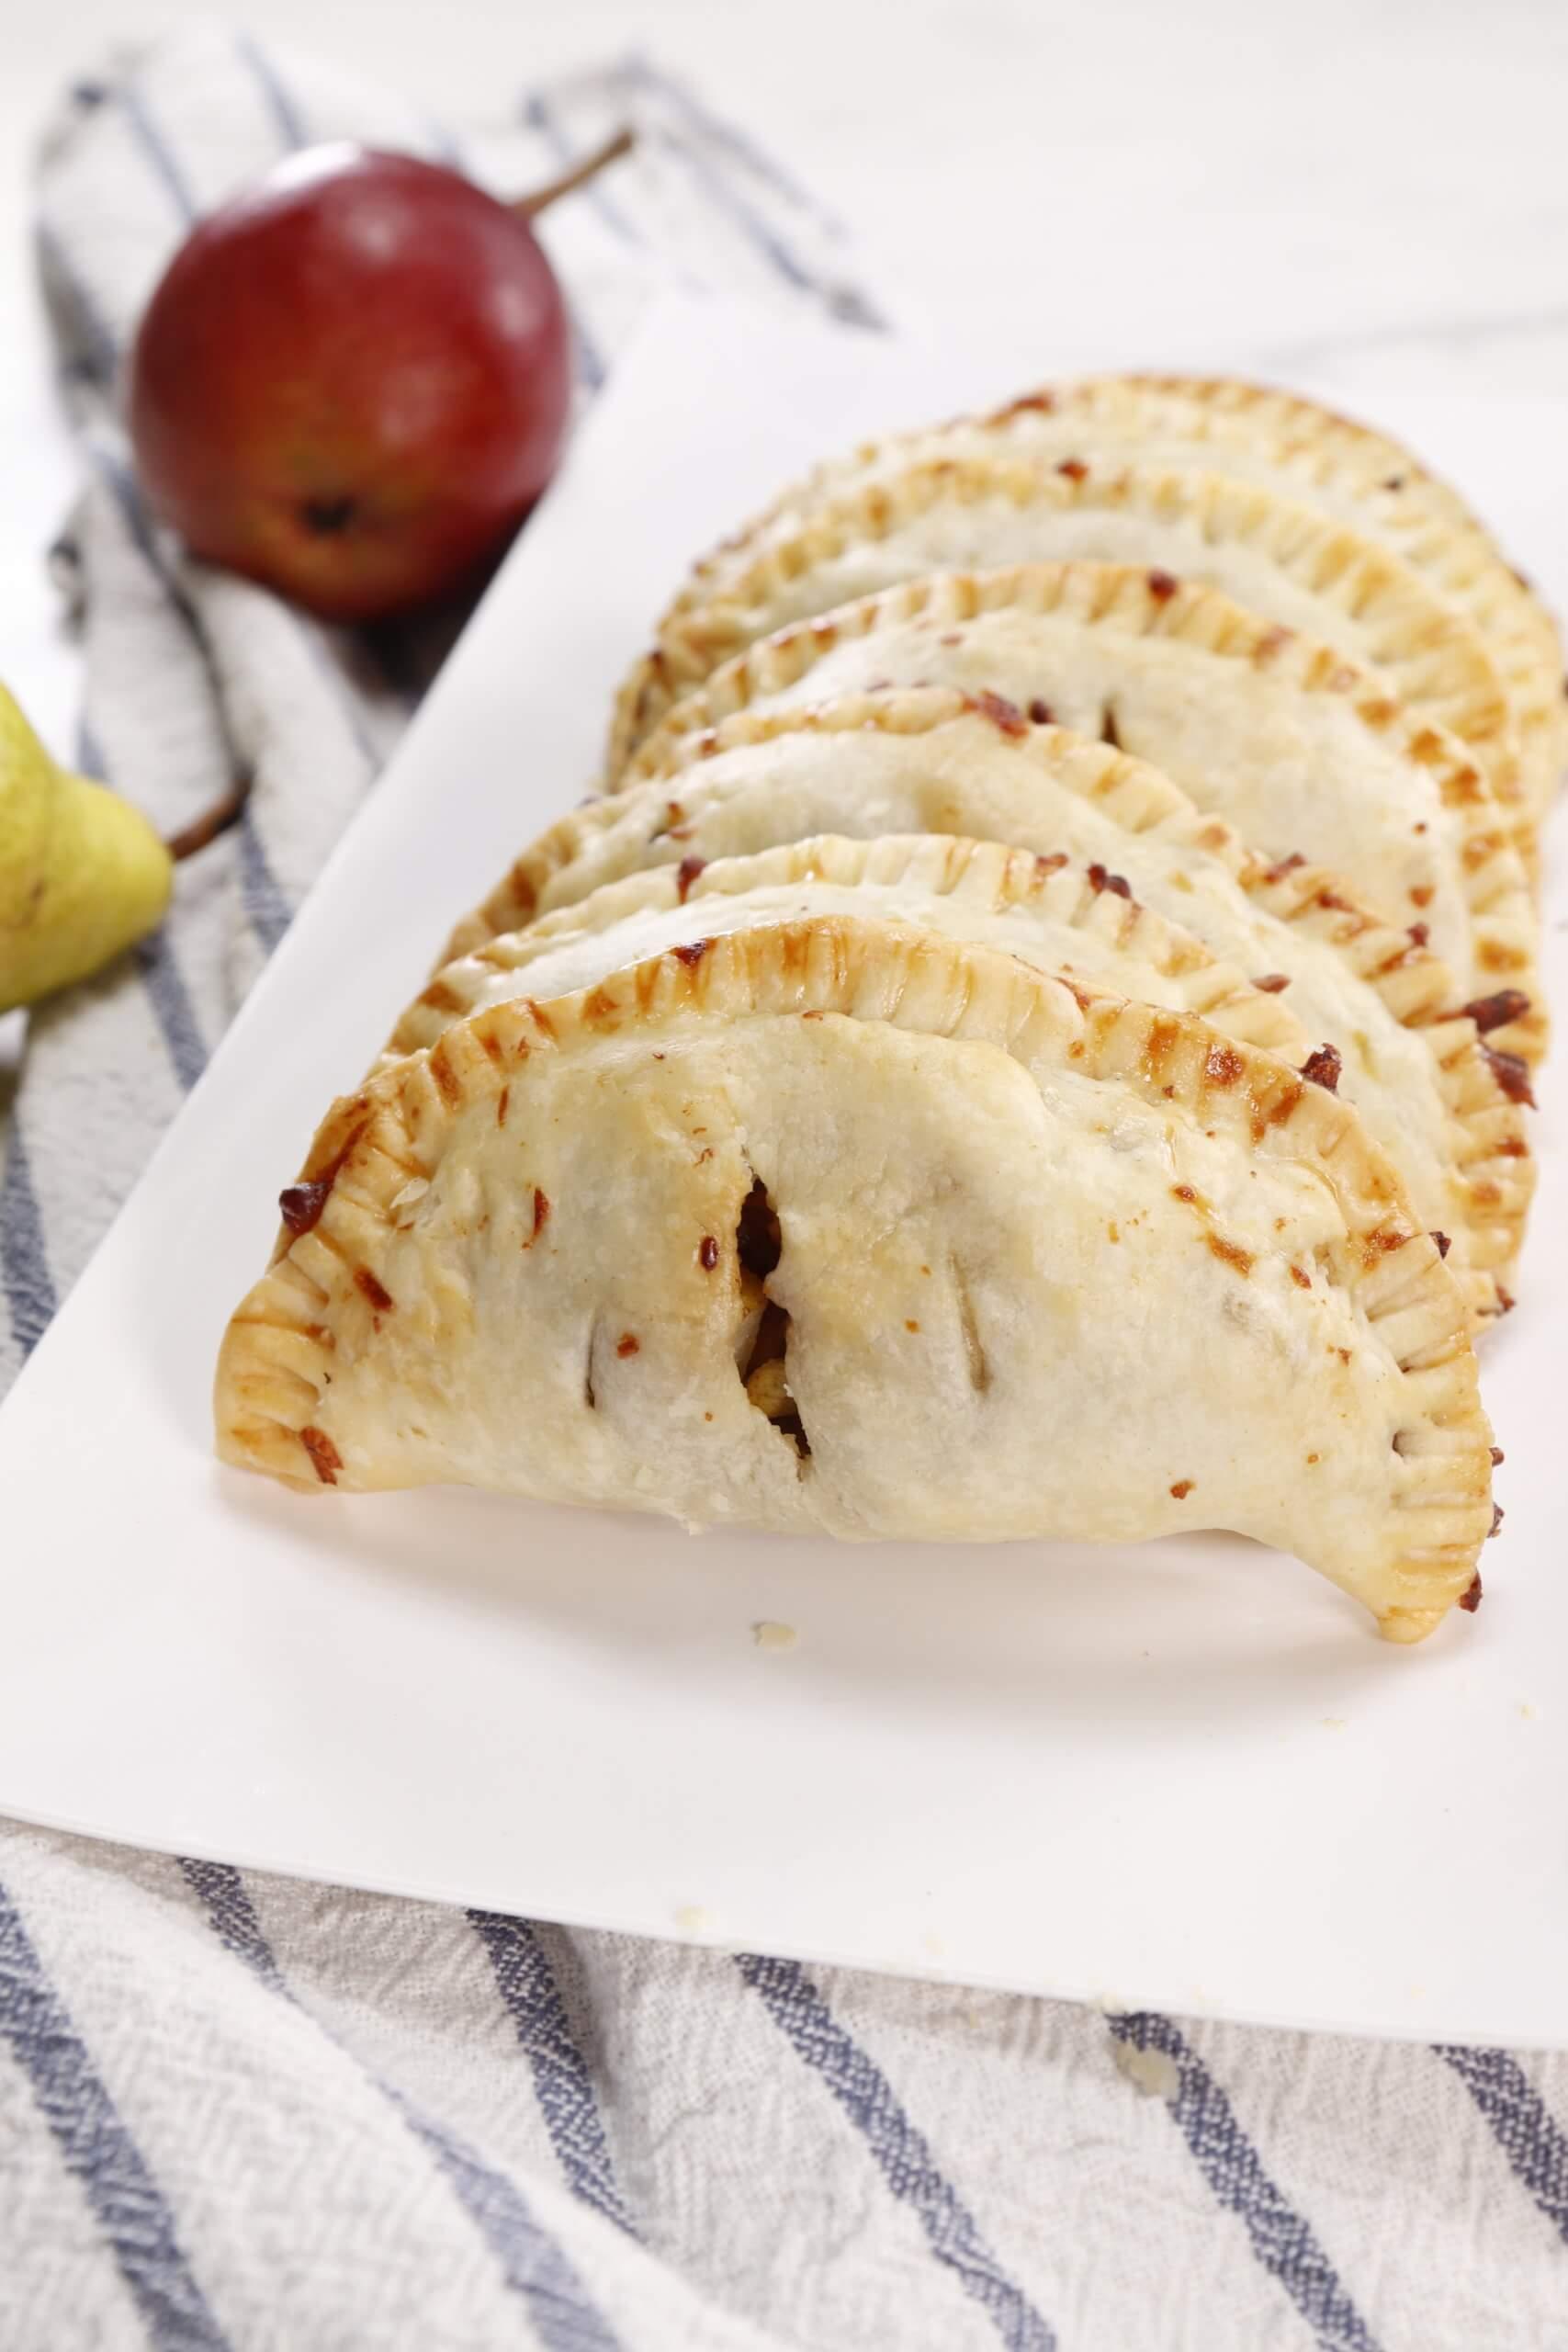 Sweet and Savory Pear Air Fryer Empanadas